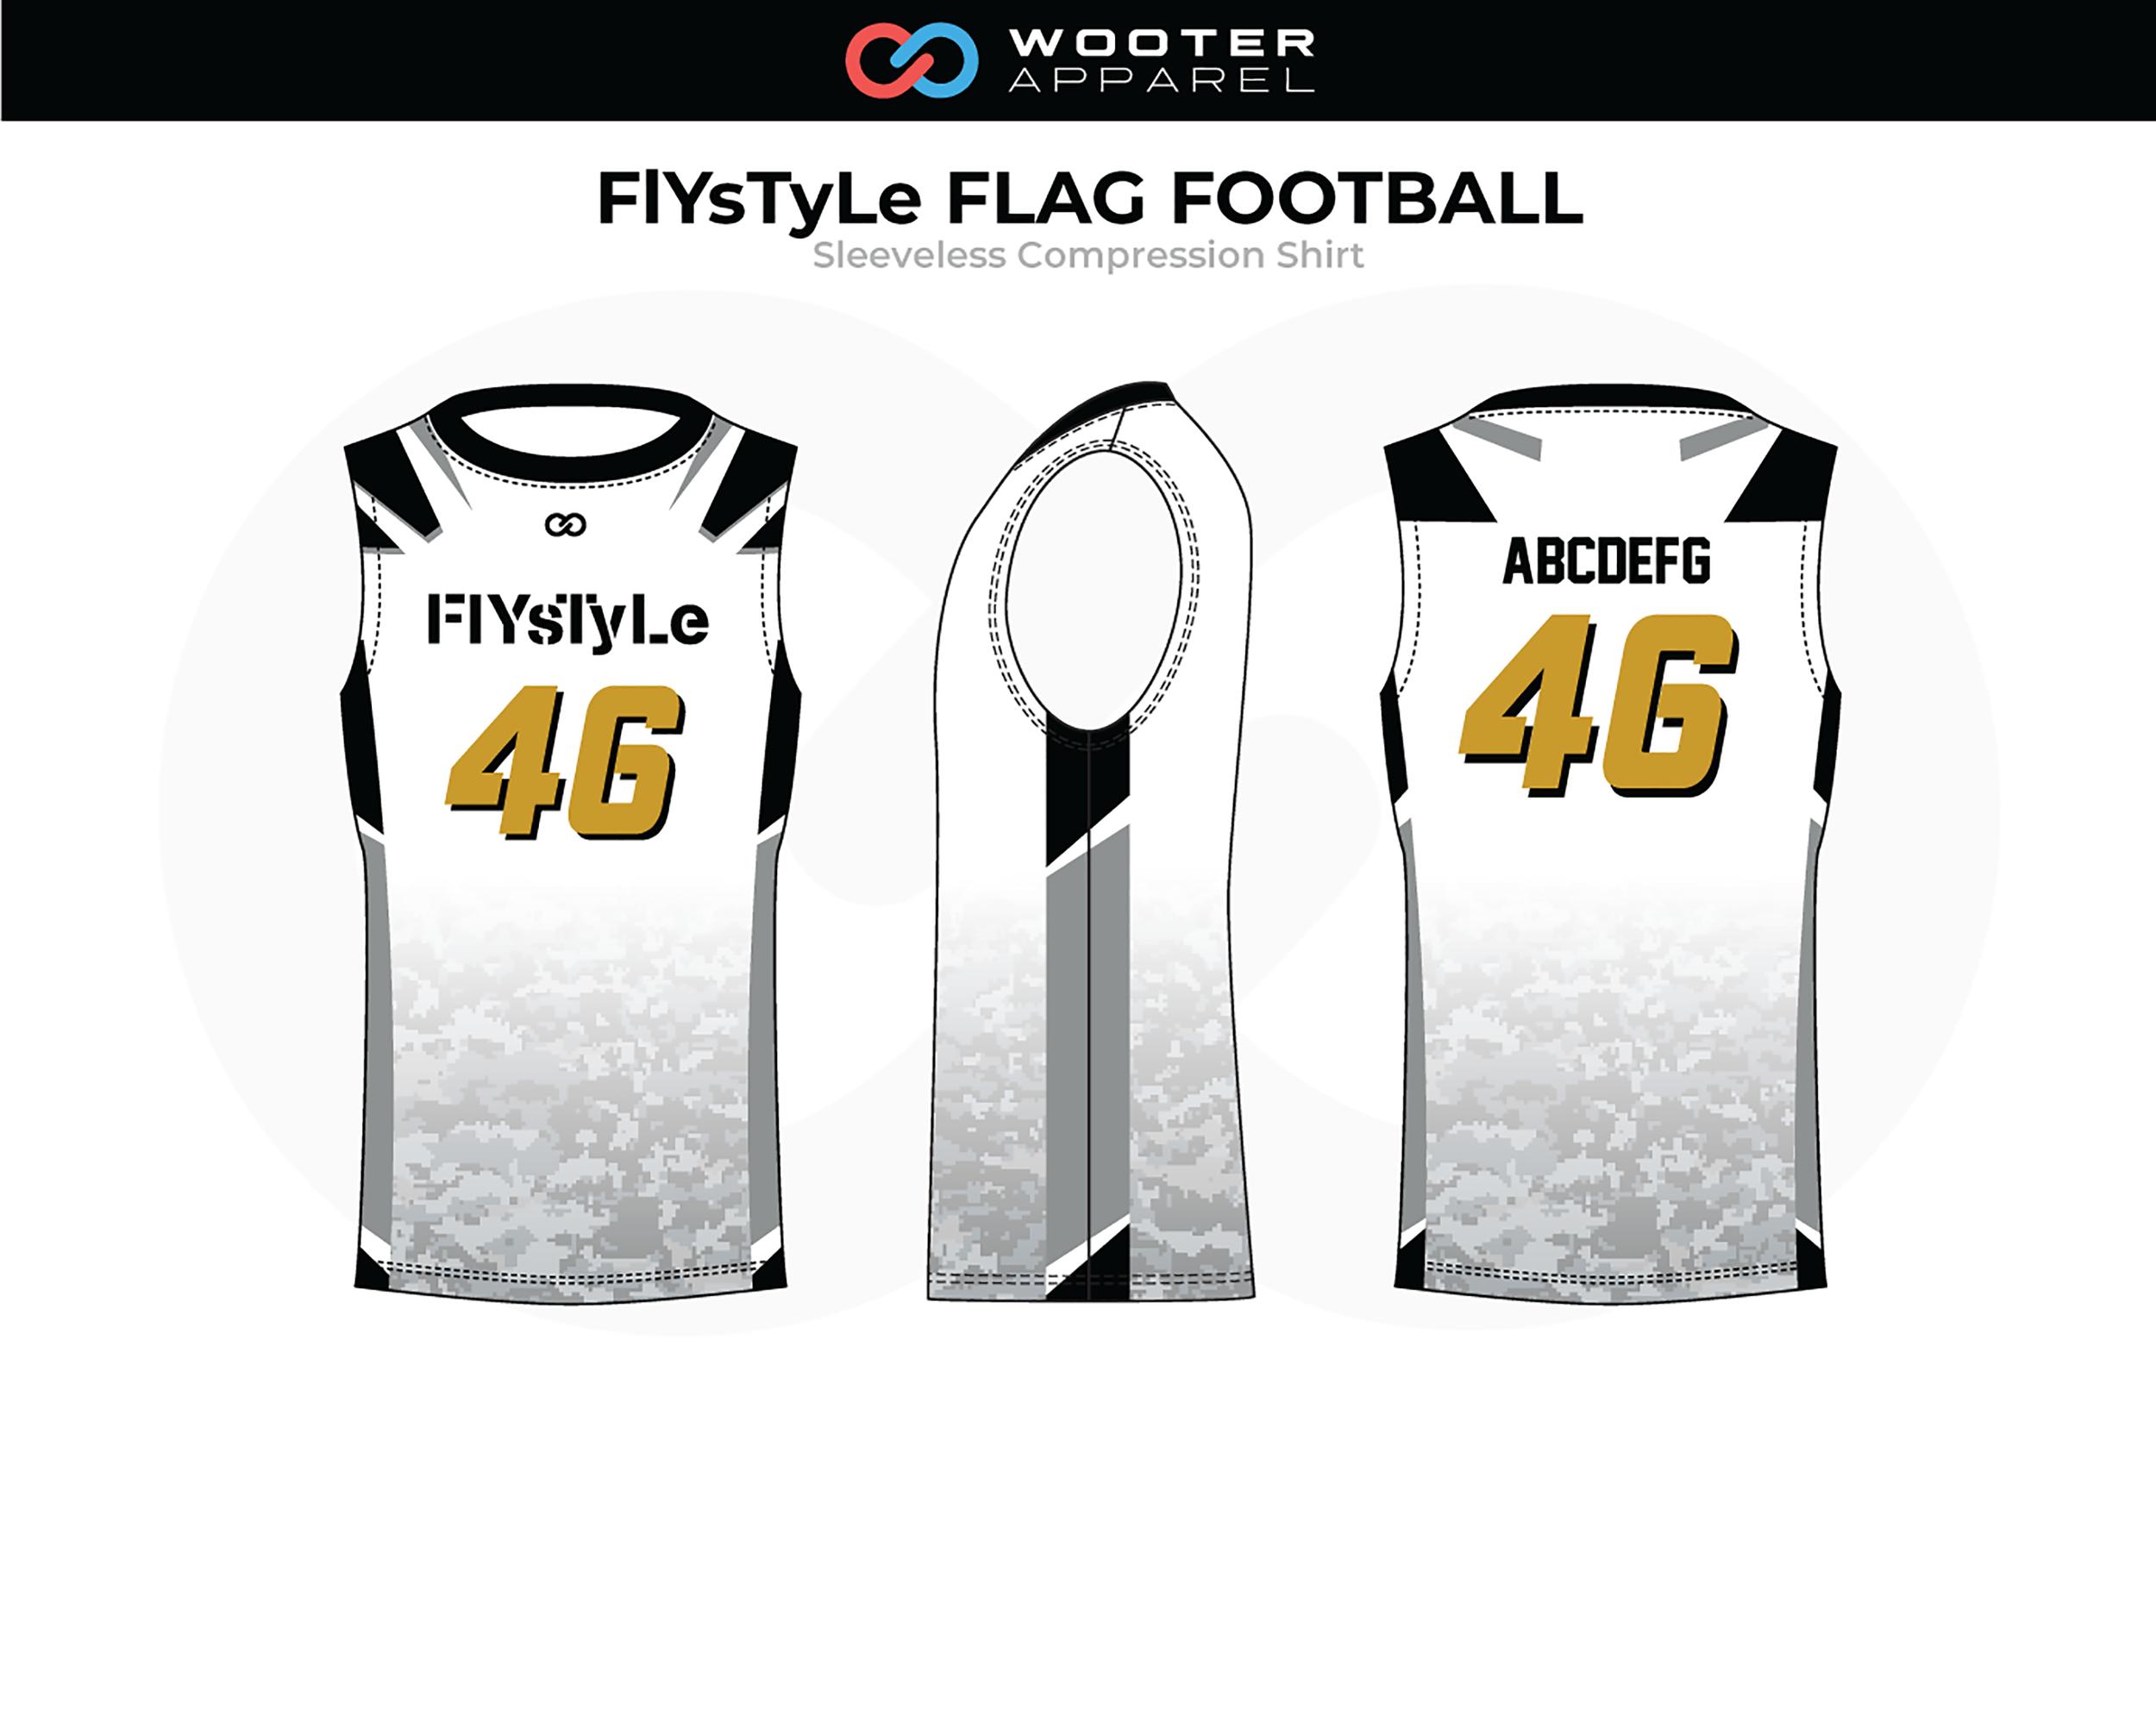 FlystyleFlagFootball_WhiteCompressionTopMockup.png